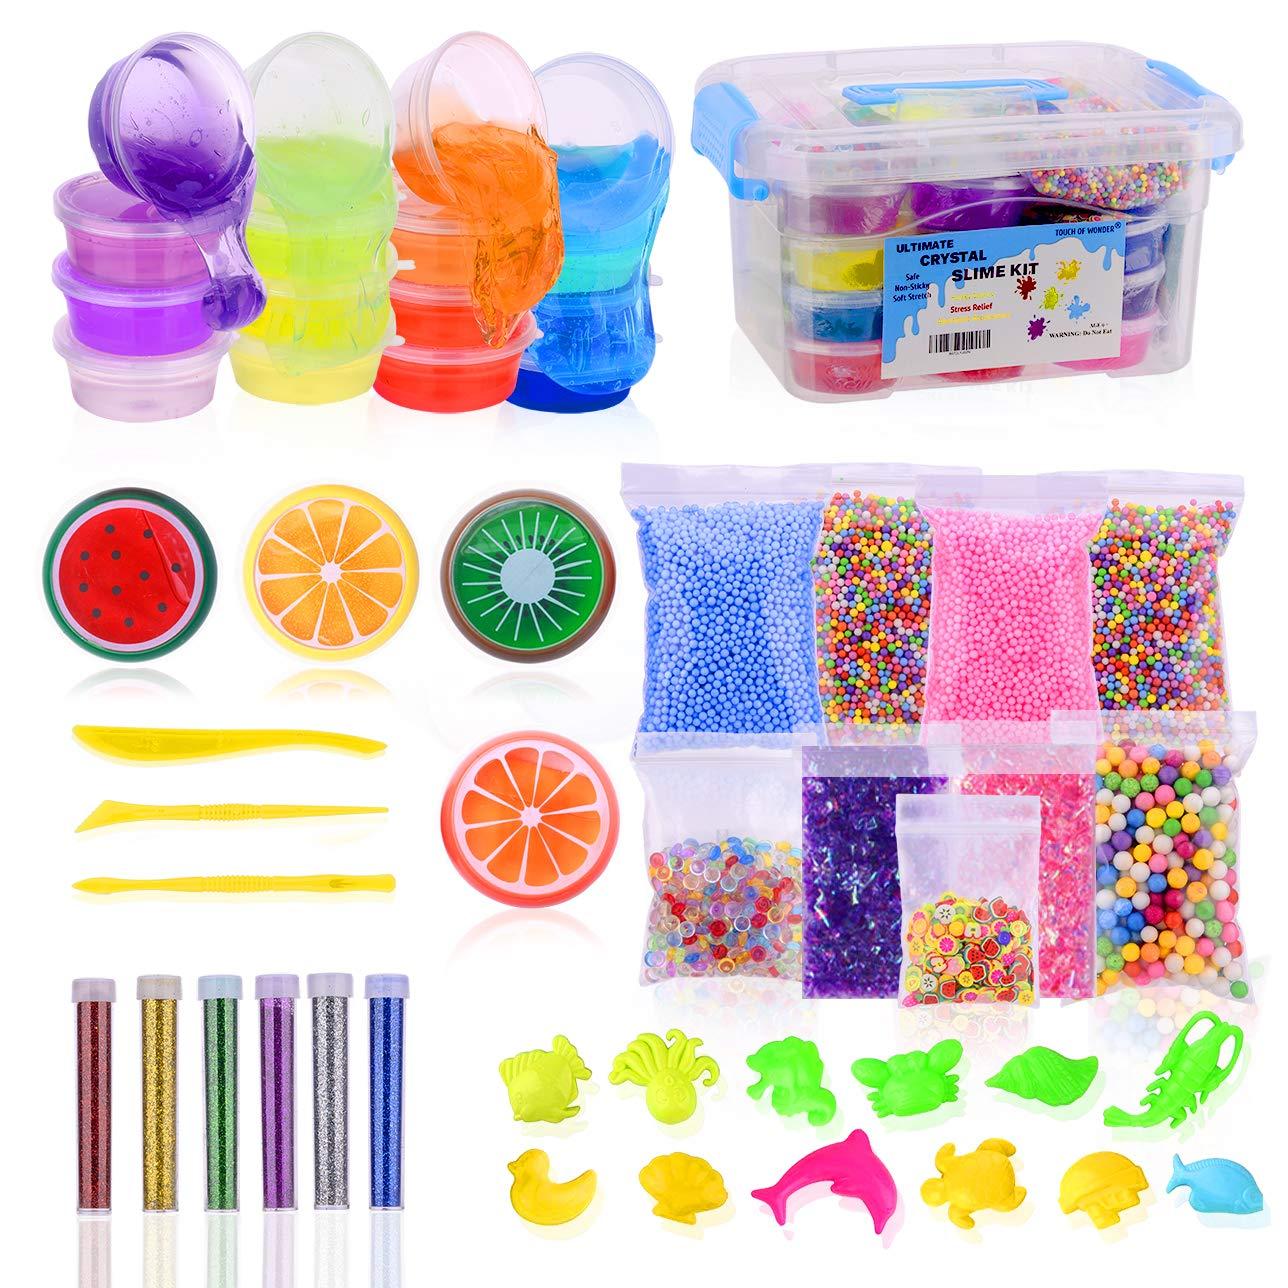 3ba8d31ed Slime Kit, Slime Making Kit for Girls & Boys, 20 Colors of Fluffy Crystal  DIY Slime Kit, Slime Kits with Everything, Supplies Include Fruit Slices,  ...